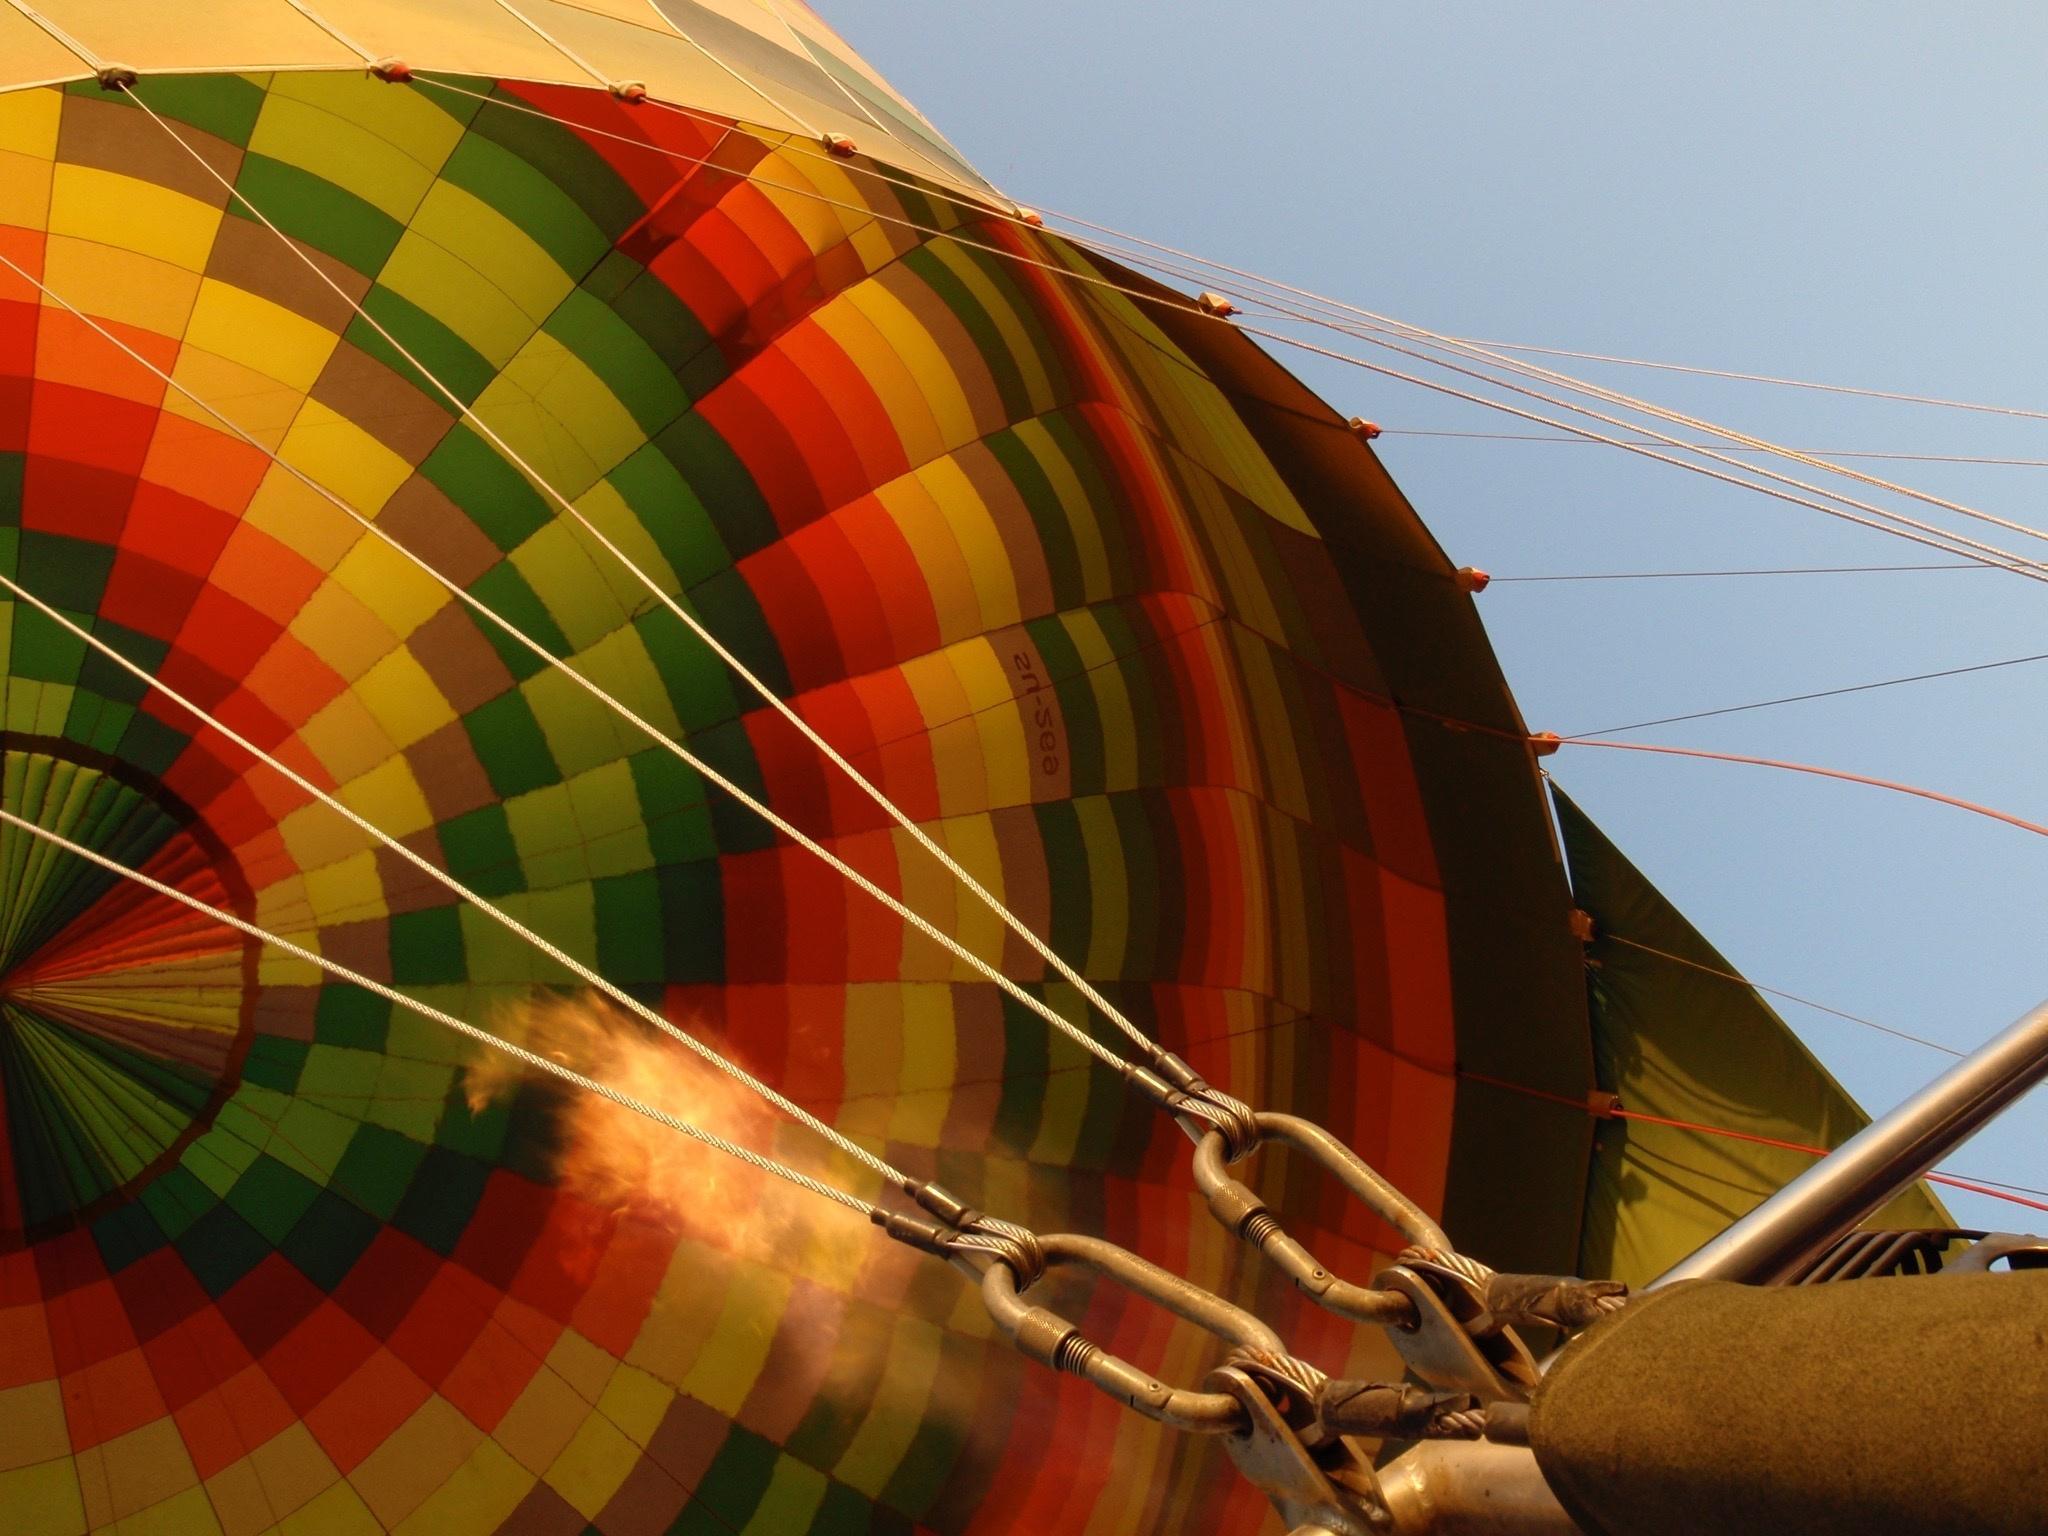 Kostenlose foto : Ballon, Flugzeug, Transport, Fahrzeug, Farbe, Flug ...